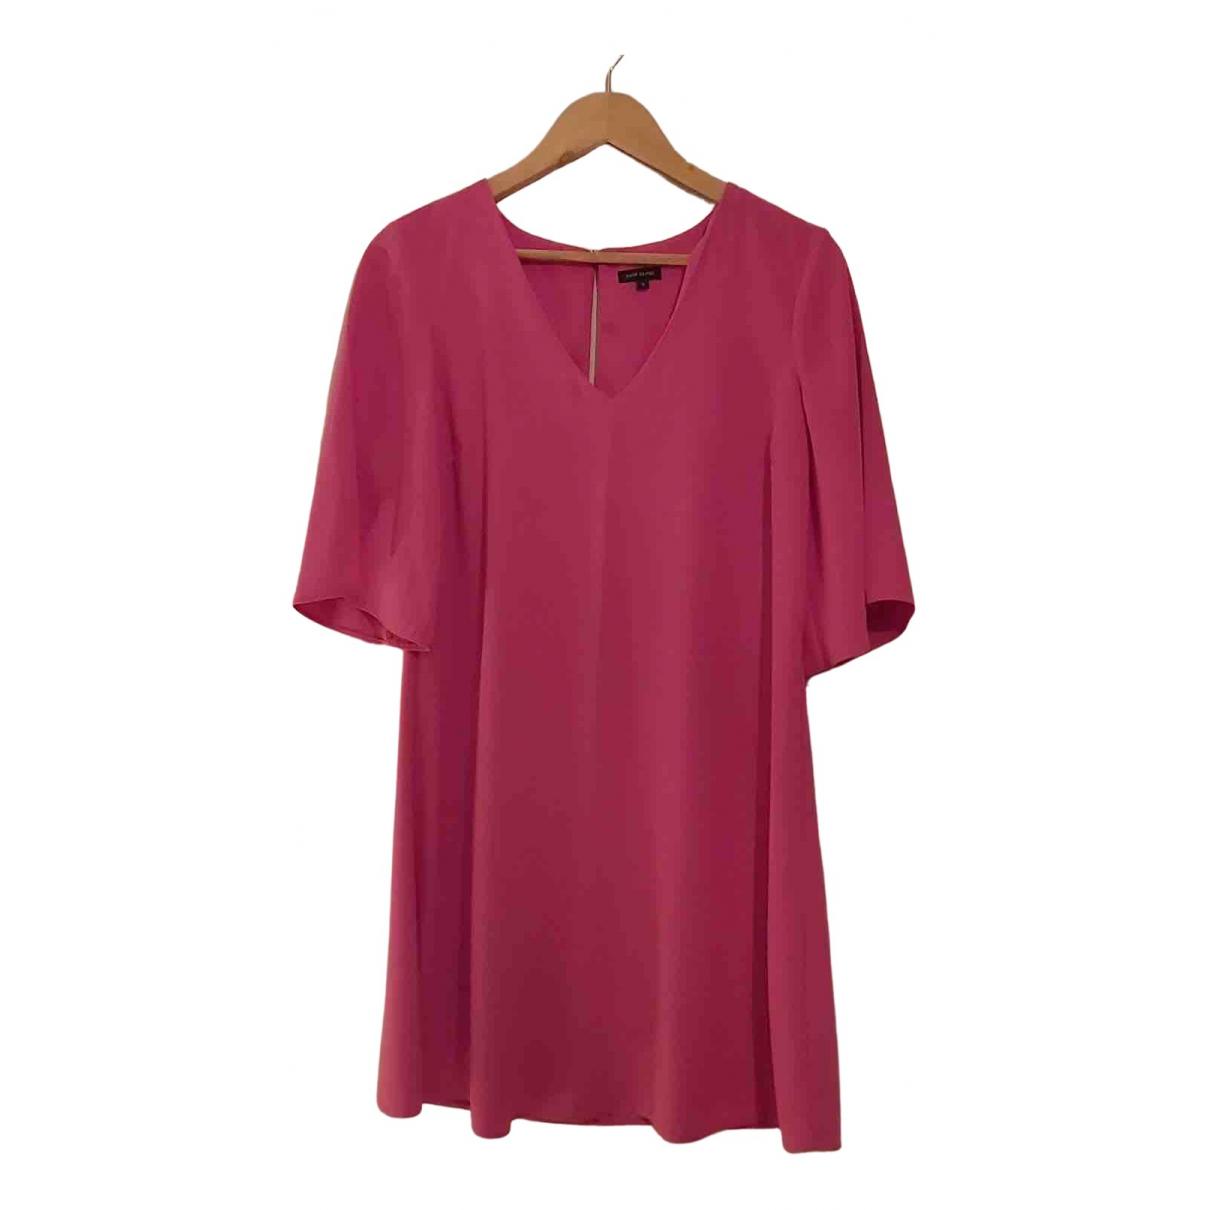 River Island N Pink dress for Women 8 UK